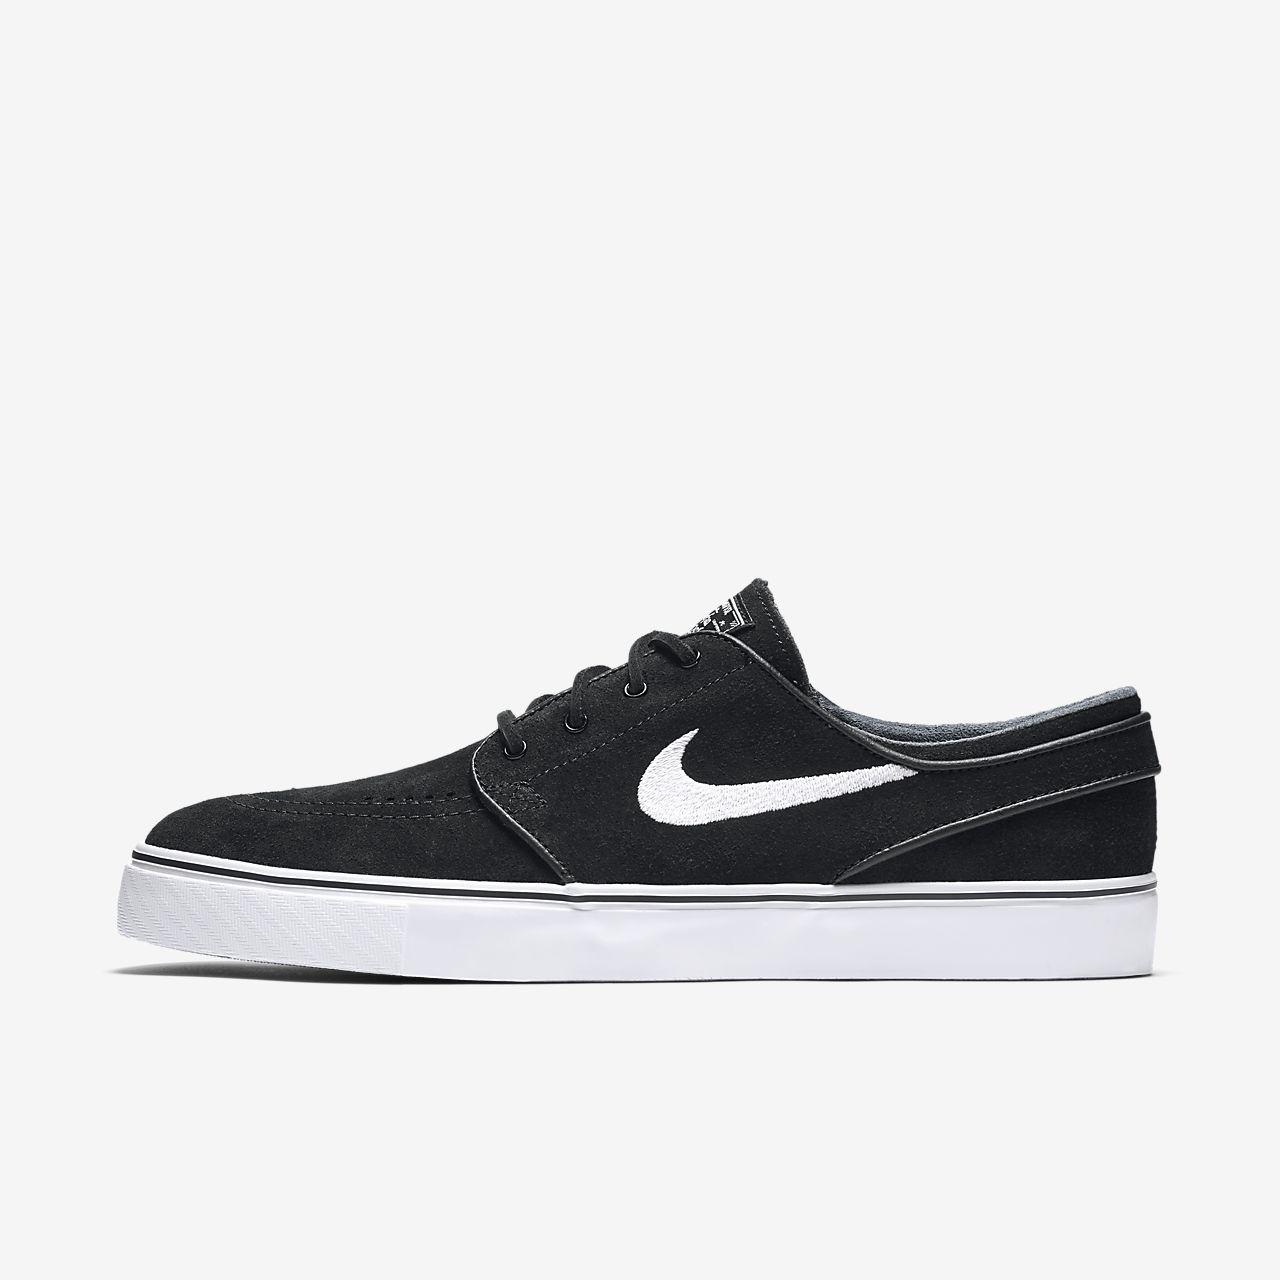 053bc846 Мужская обувь для скейтбординга Nike SB Zoom Stefan Janoski OG. Nike ...